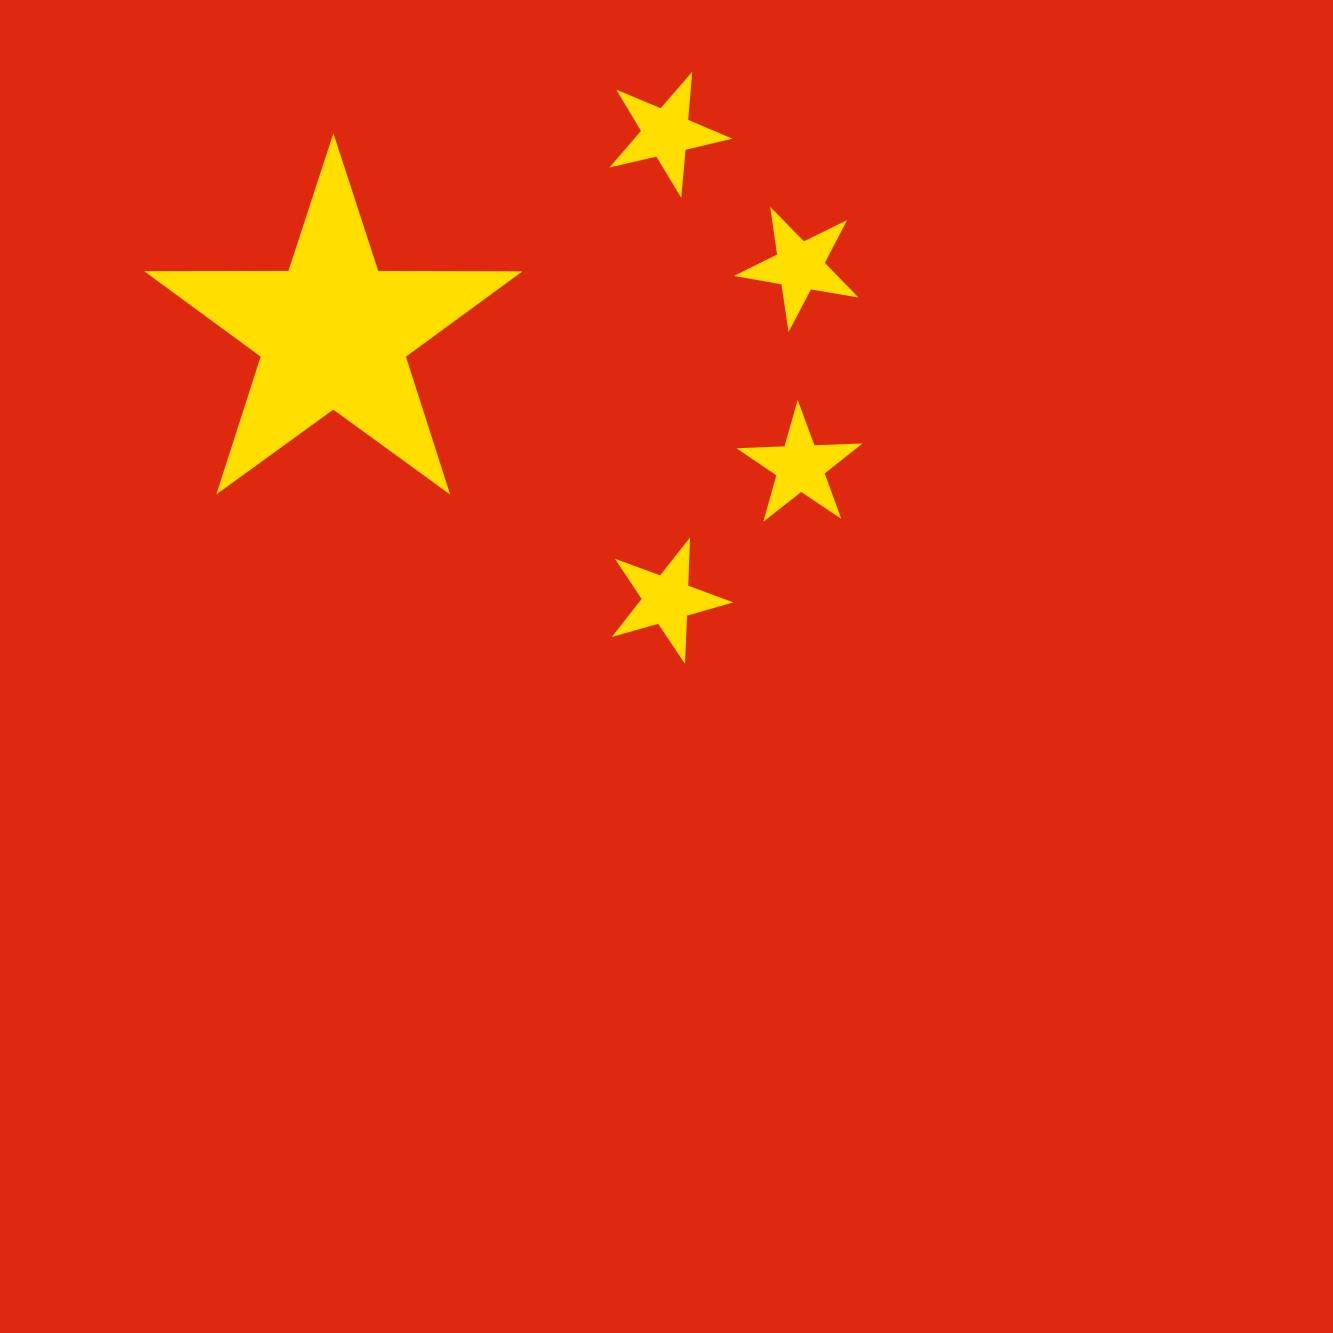 Flag_of_China.jpg